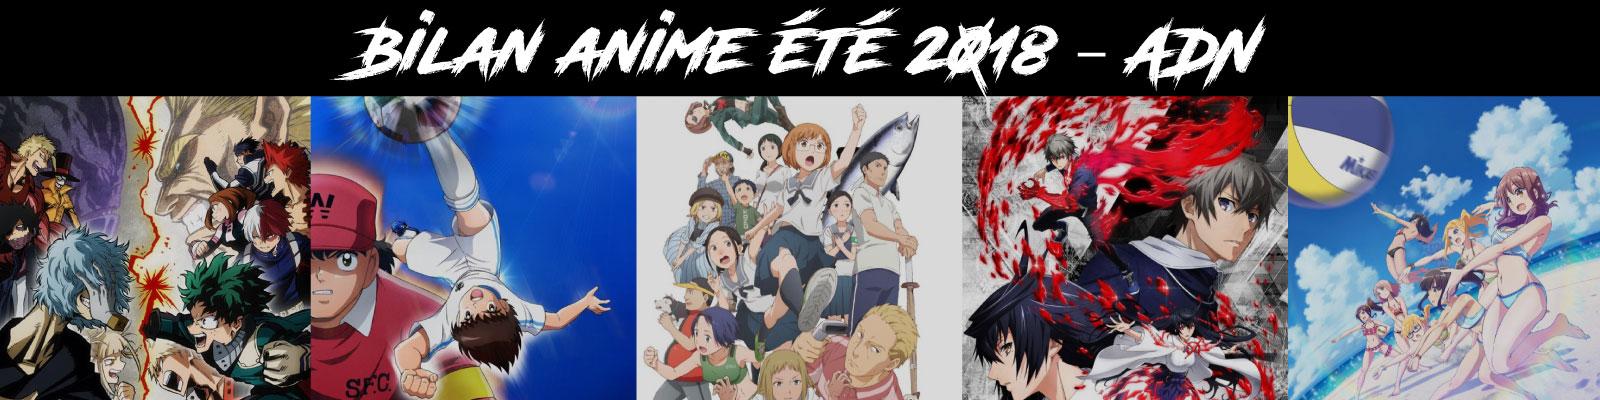 Bilan anime été 2018 - ADN